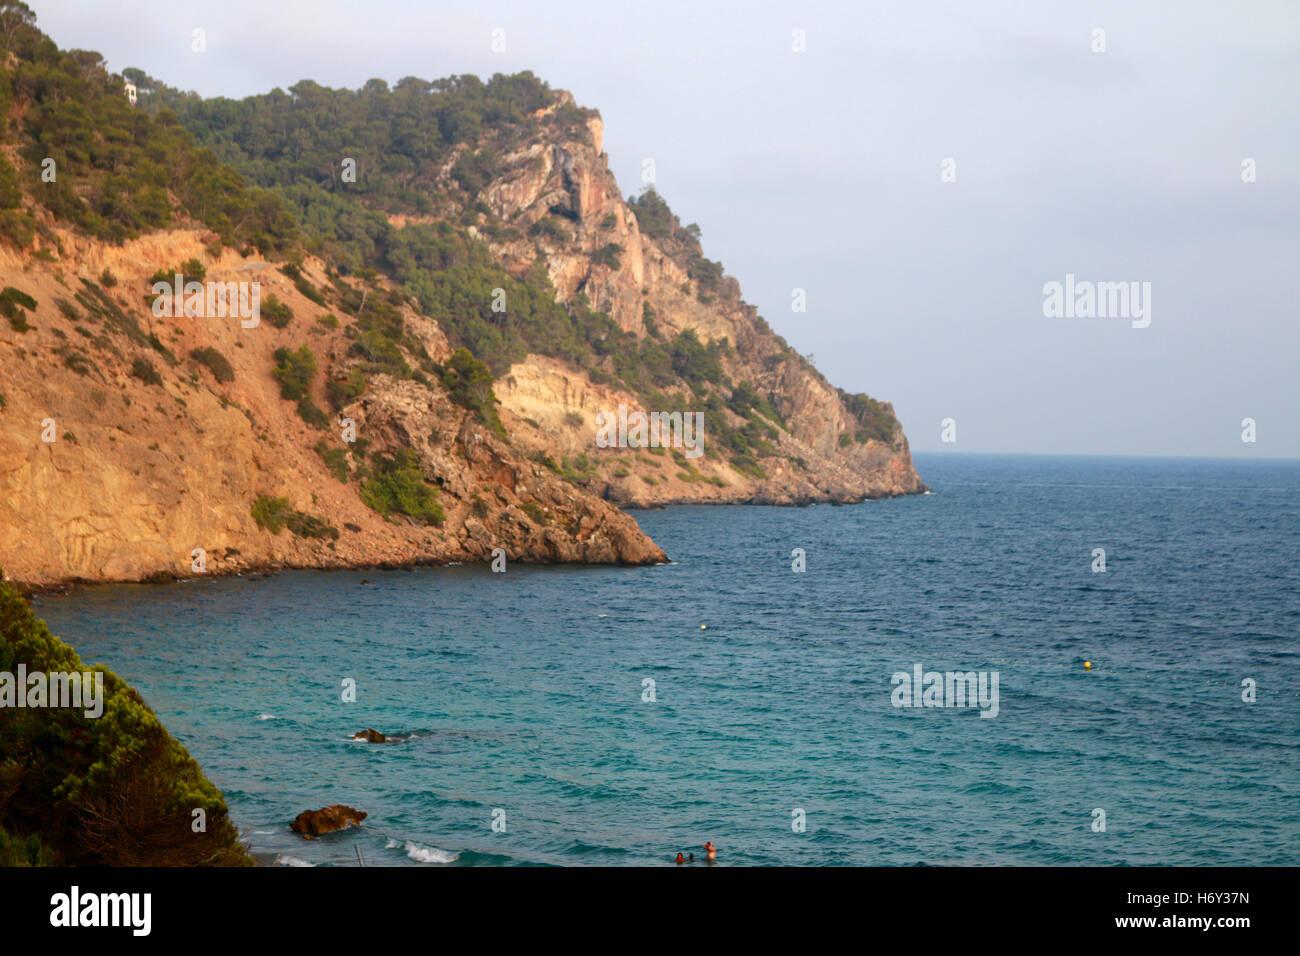 Impressionen: Mittelmeer, Ibiza, Spanien. - Stock Image